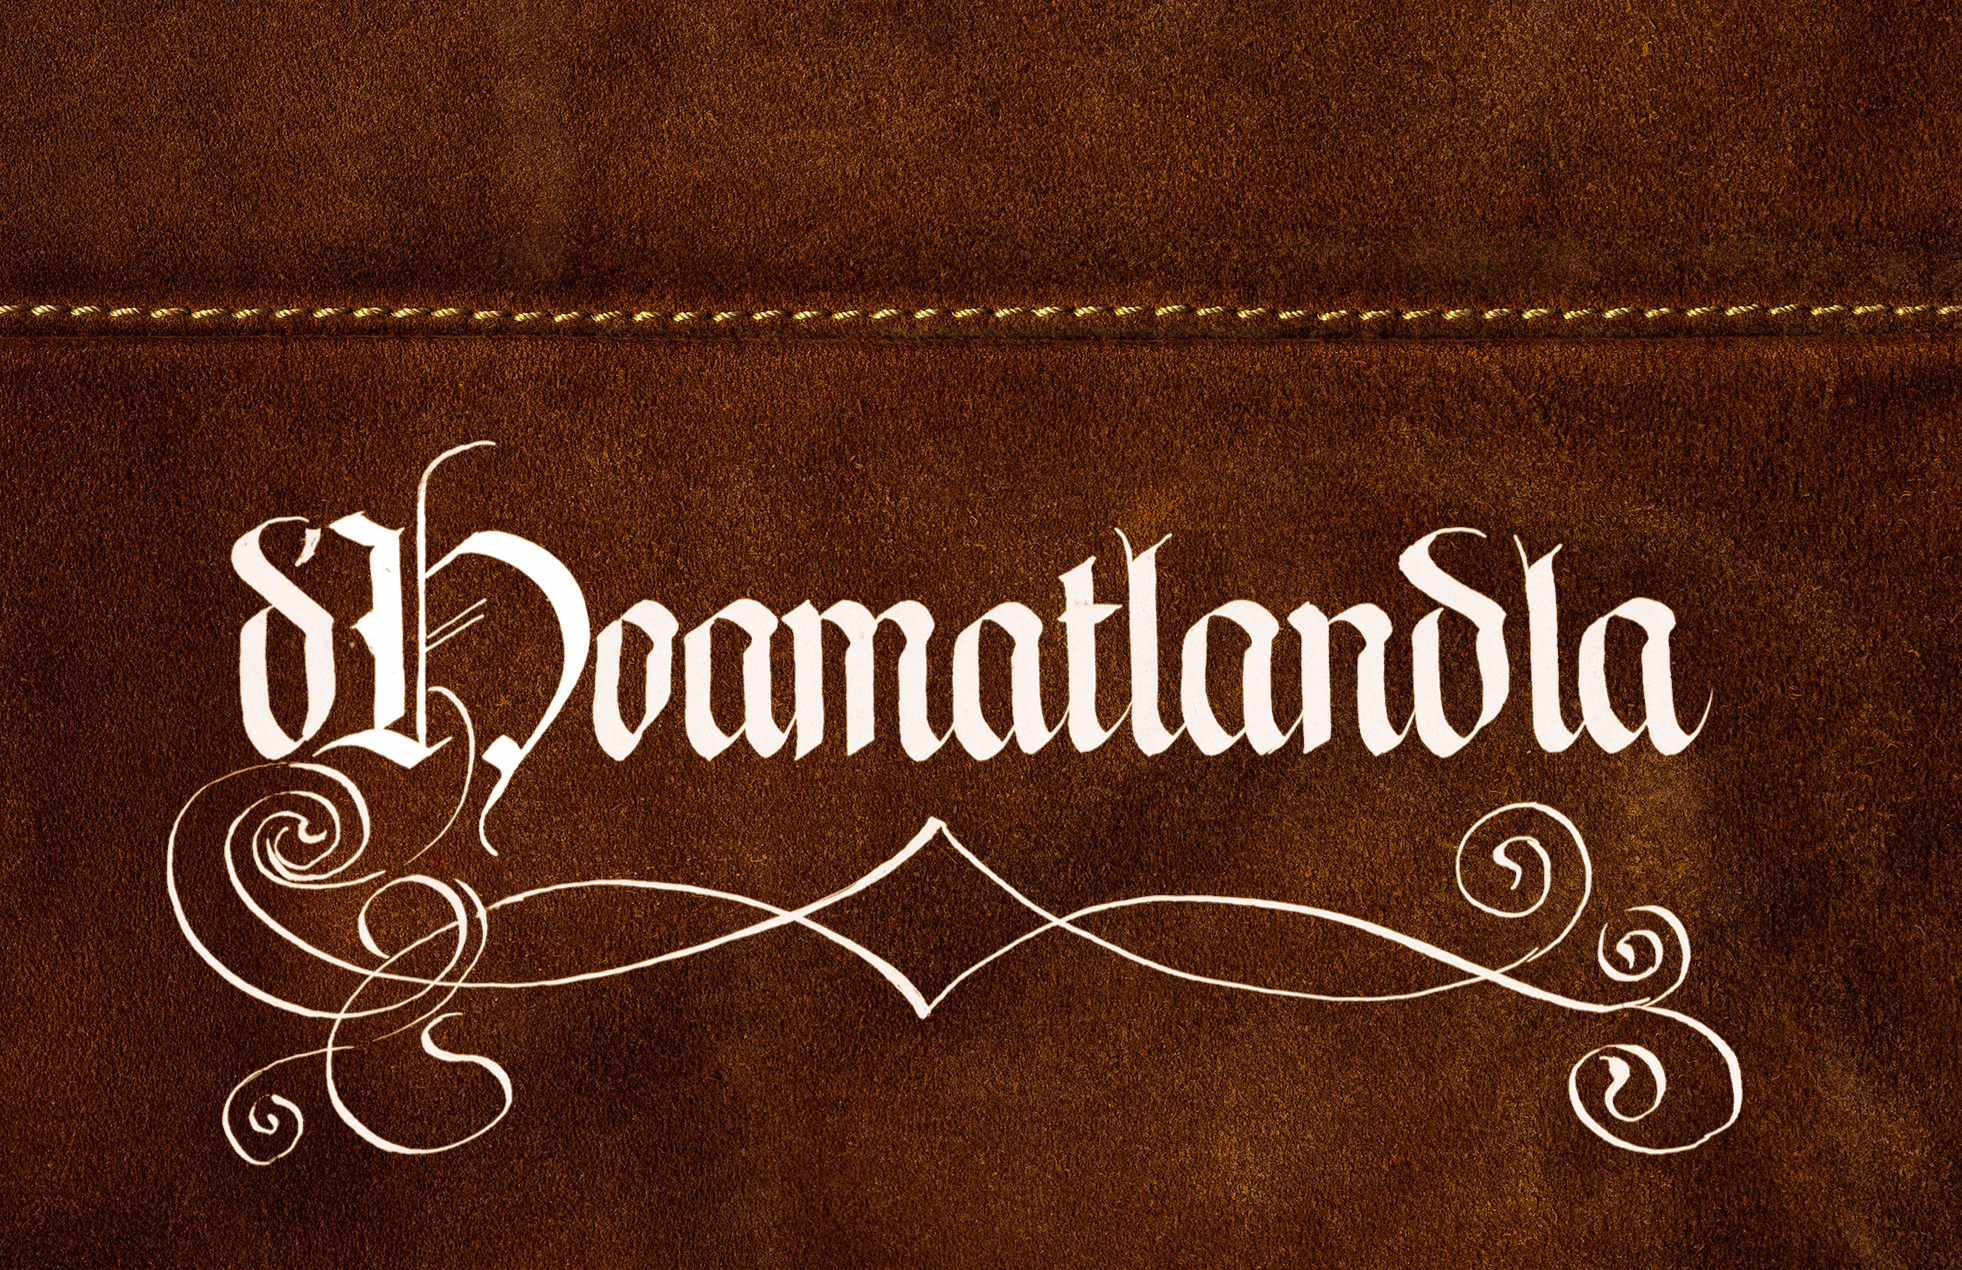 dHoamatlandla_Logo.jpg